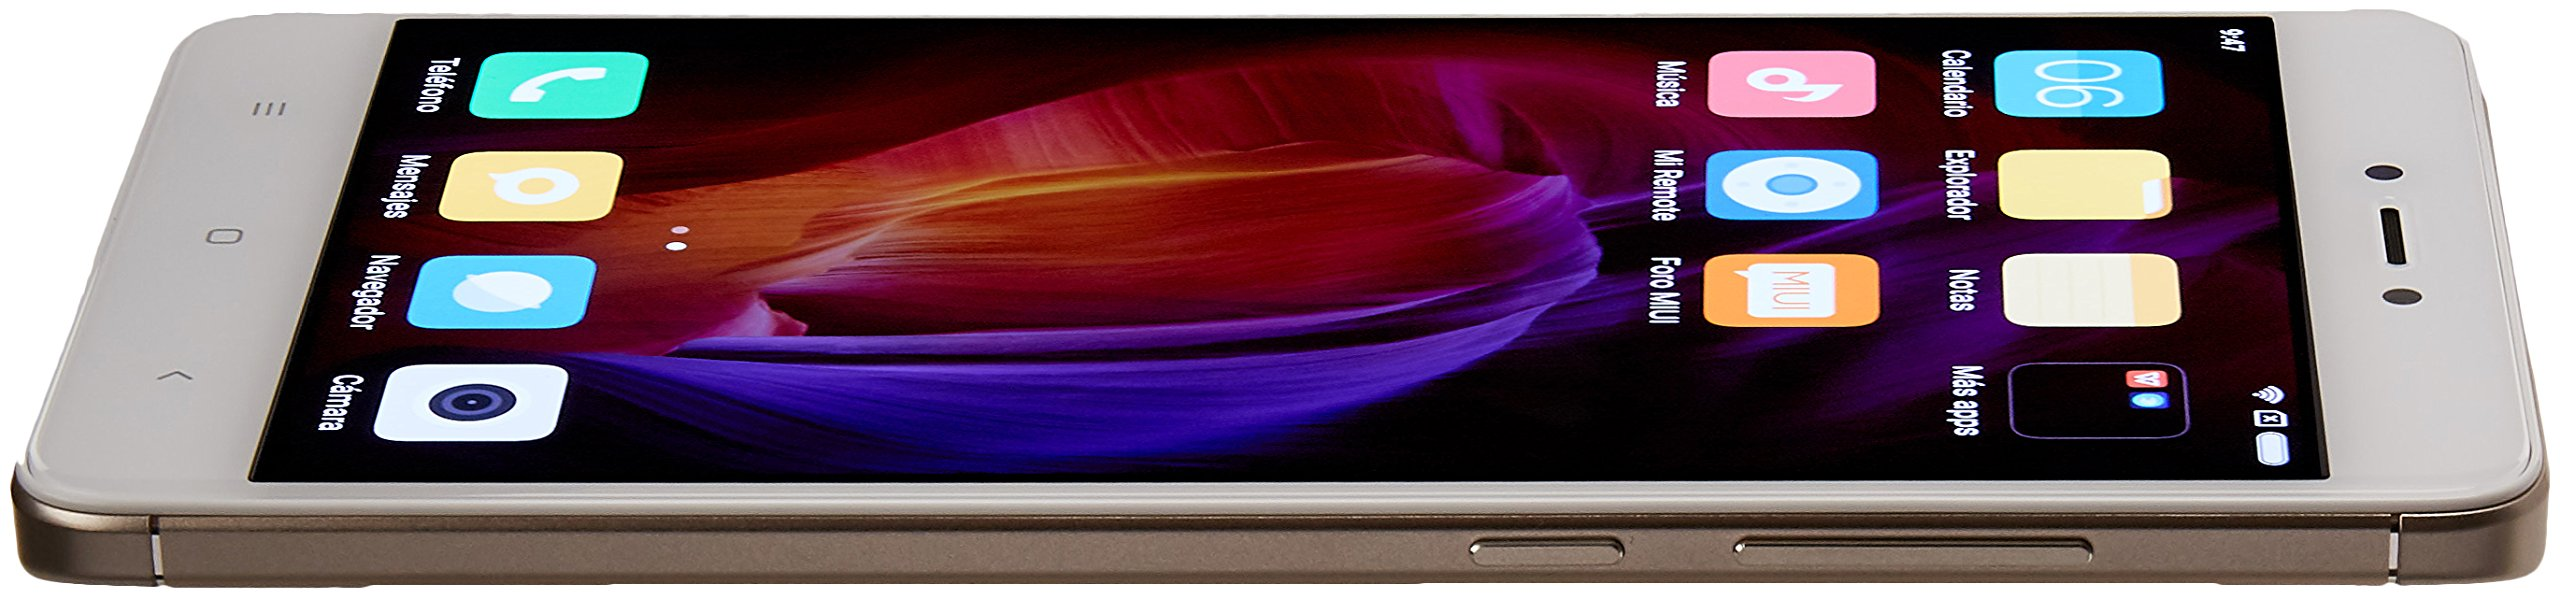 Xiaomi Redmi Note 4 5.5-Inch GSM Unlocked Smartphone with Dual LTE, 32GB, Dual Sim, 13MP, No Warranty - International Version (Gold) by Xiaomi